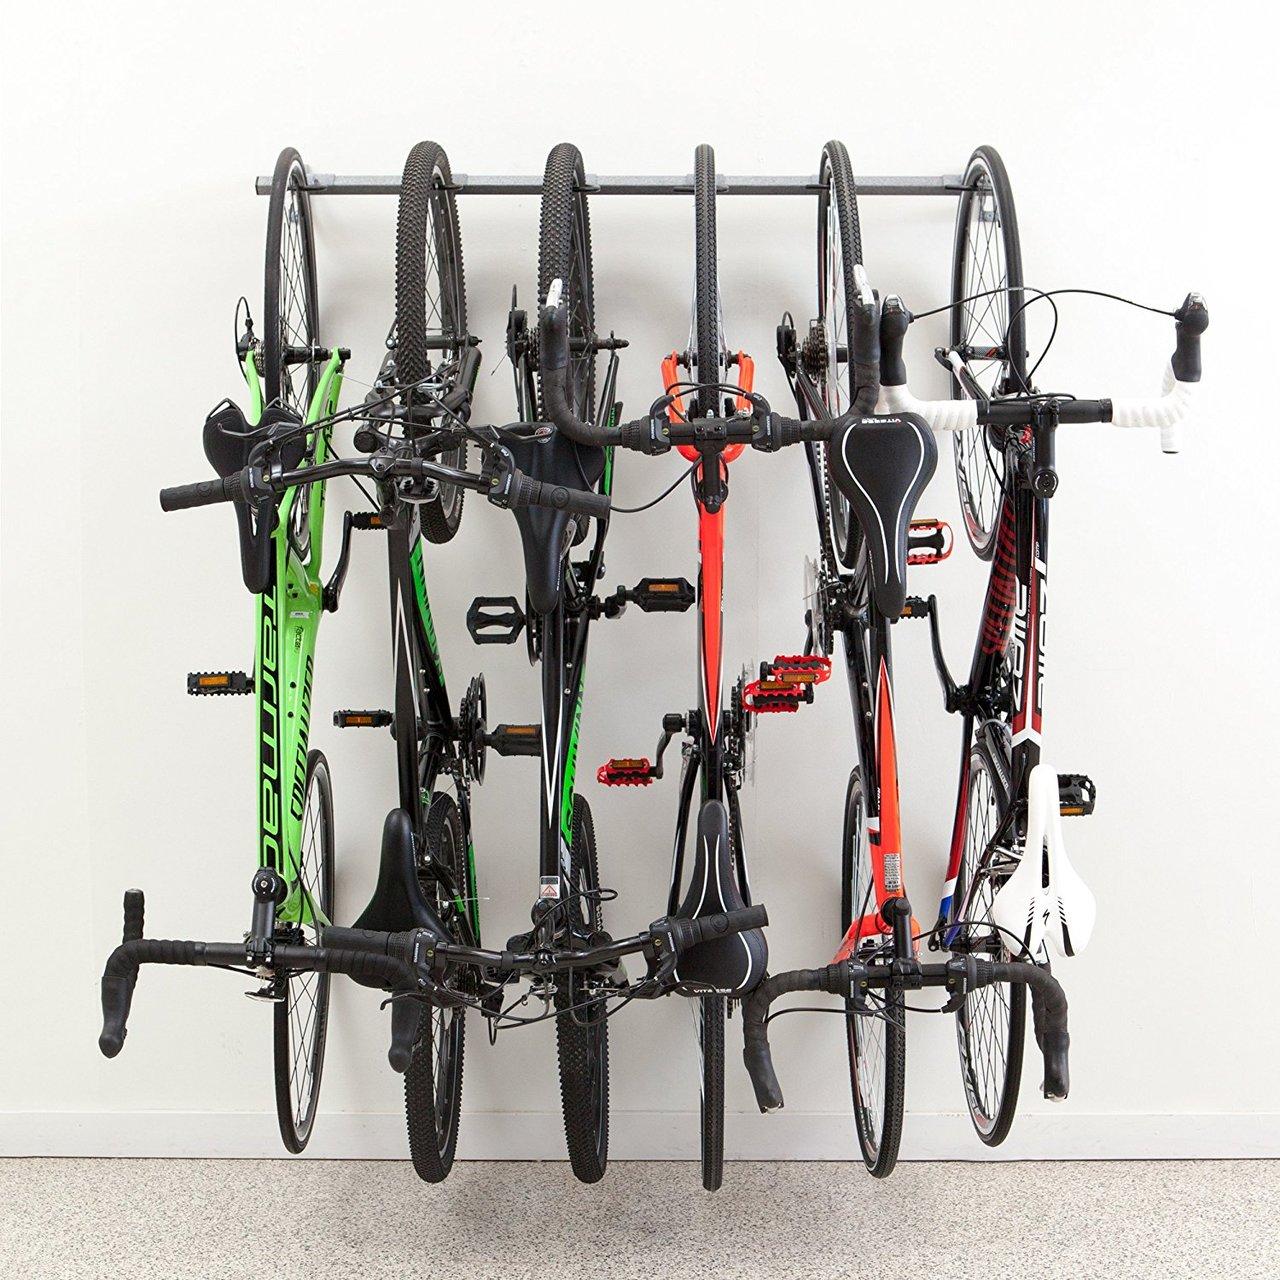 Bike Storage Rack | 6 Hanging Bikes  sc 1 st  StoreYourBoard & Bike Storage Rack | 6 Hanging Bikes - StoreYourBoard.com